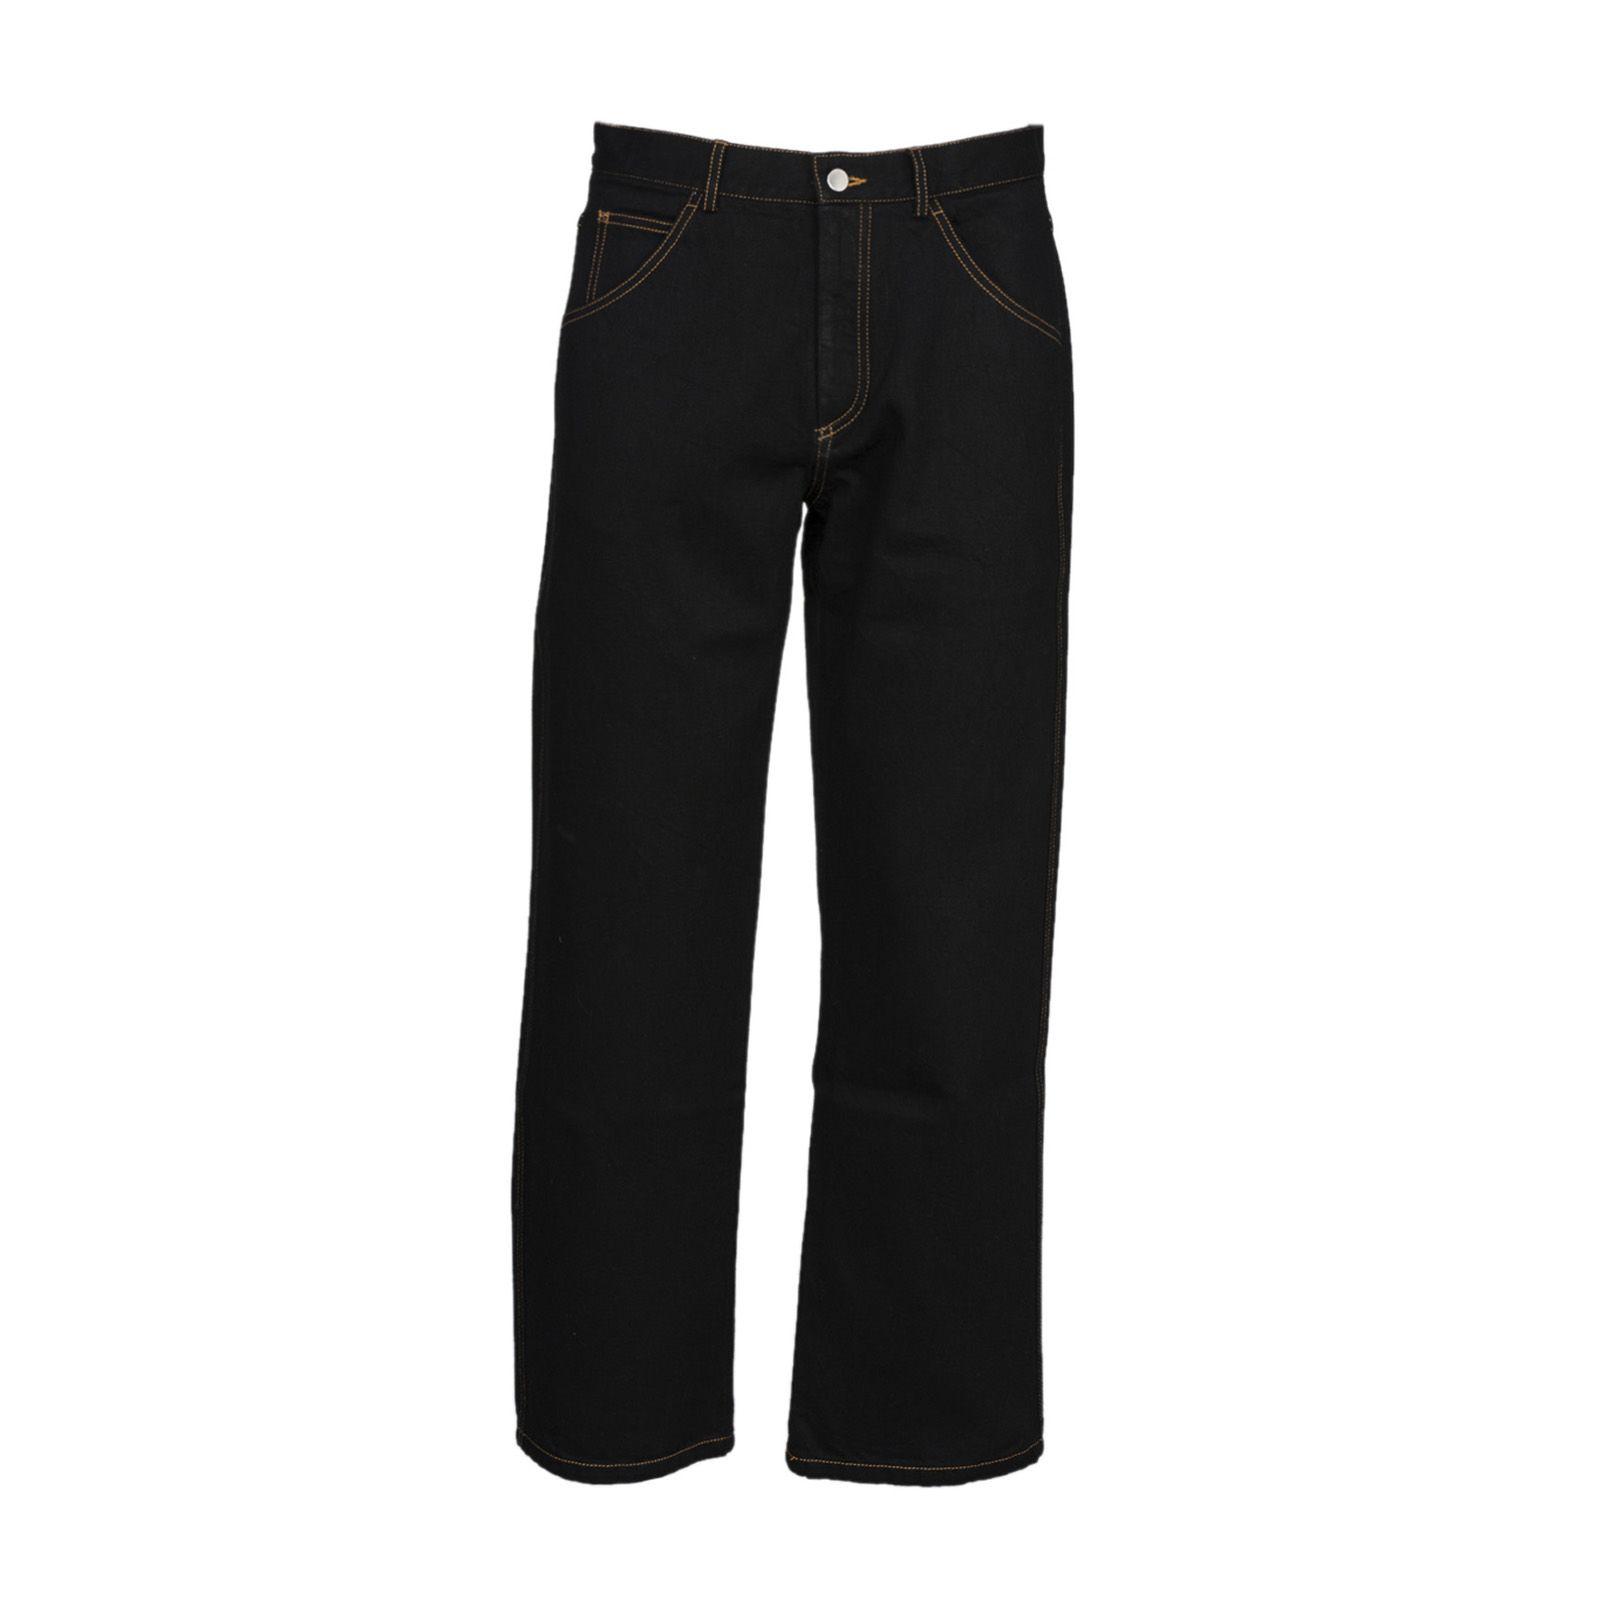 Gosha Rubchinskiy Classic Wide-leg Jeans